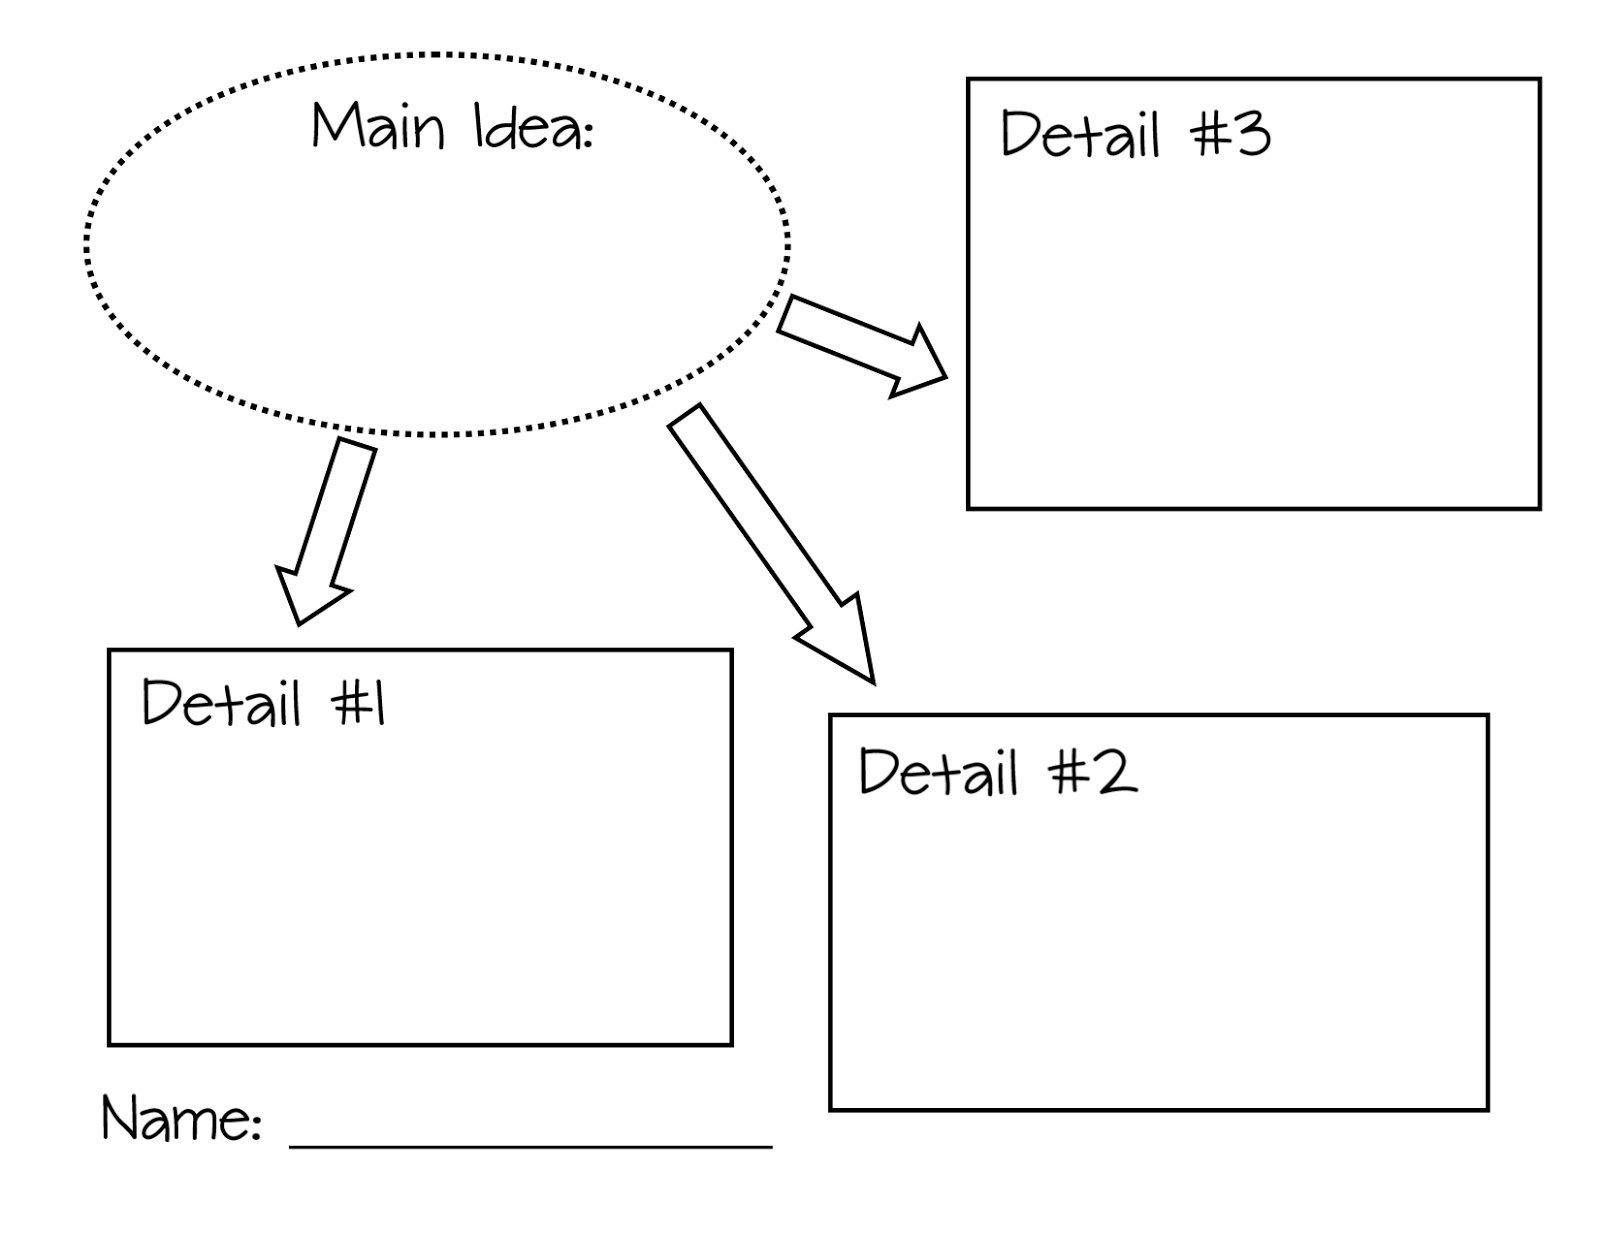 10 Fantastic Main Idea For 3Rd Grade ms bakamis 3rd grade class main ideas supportive details 2 2020